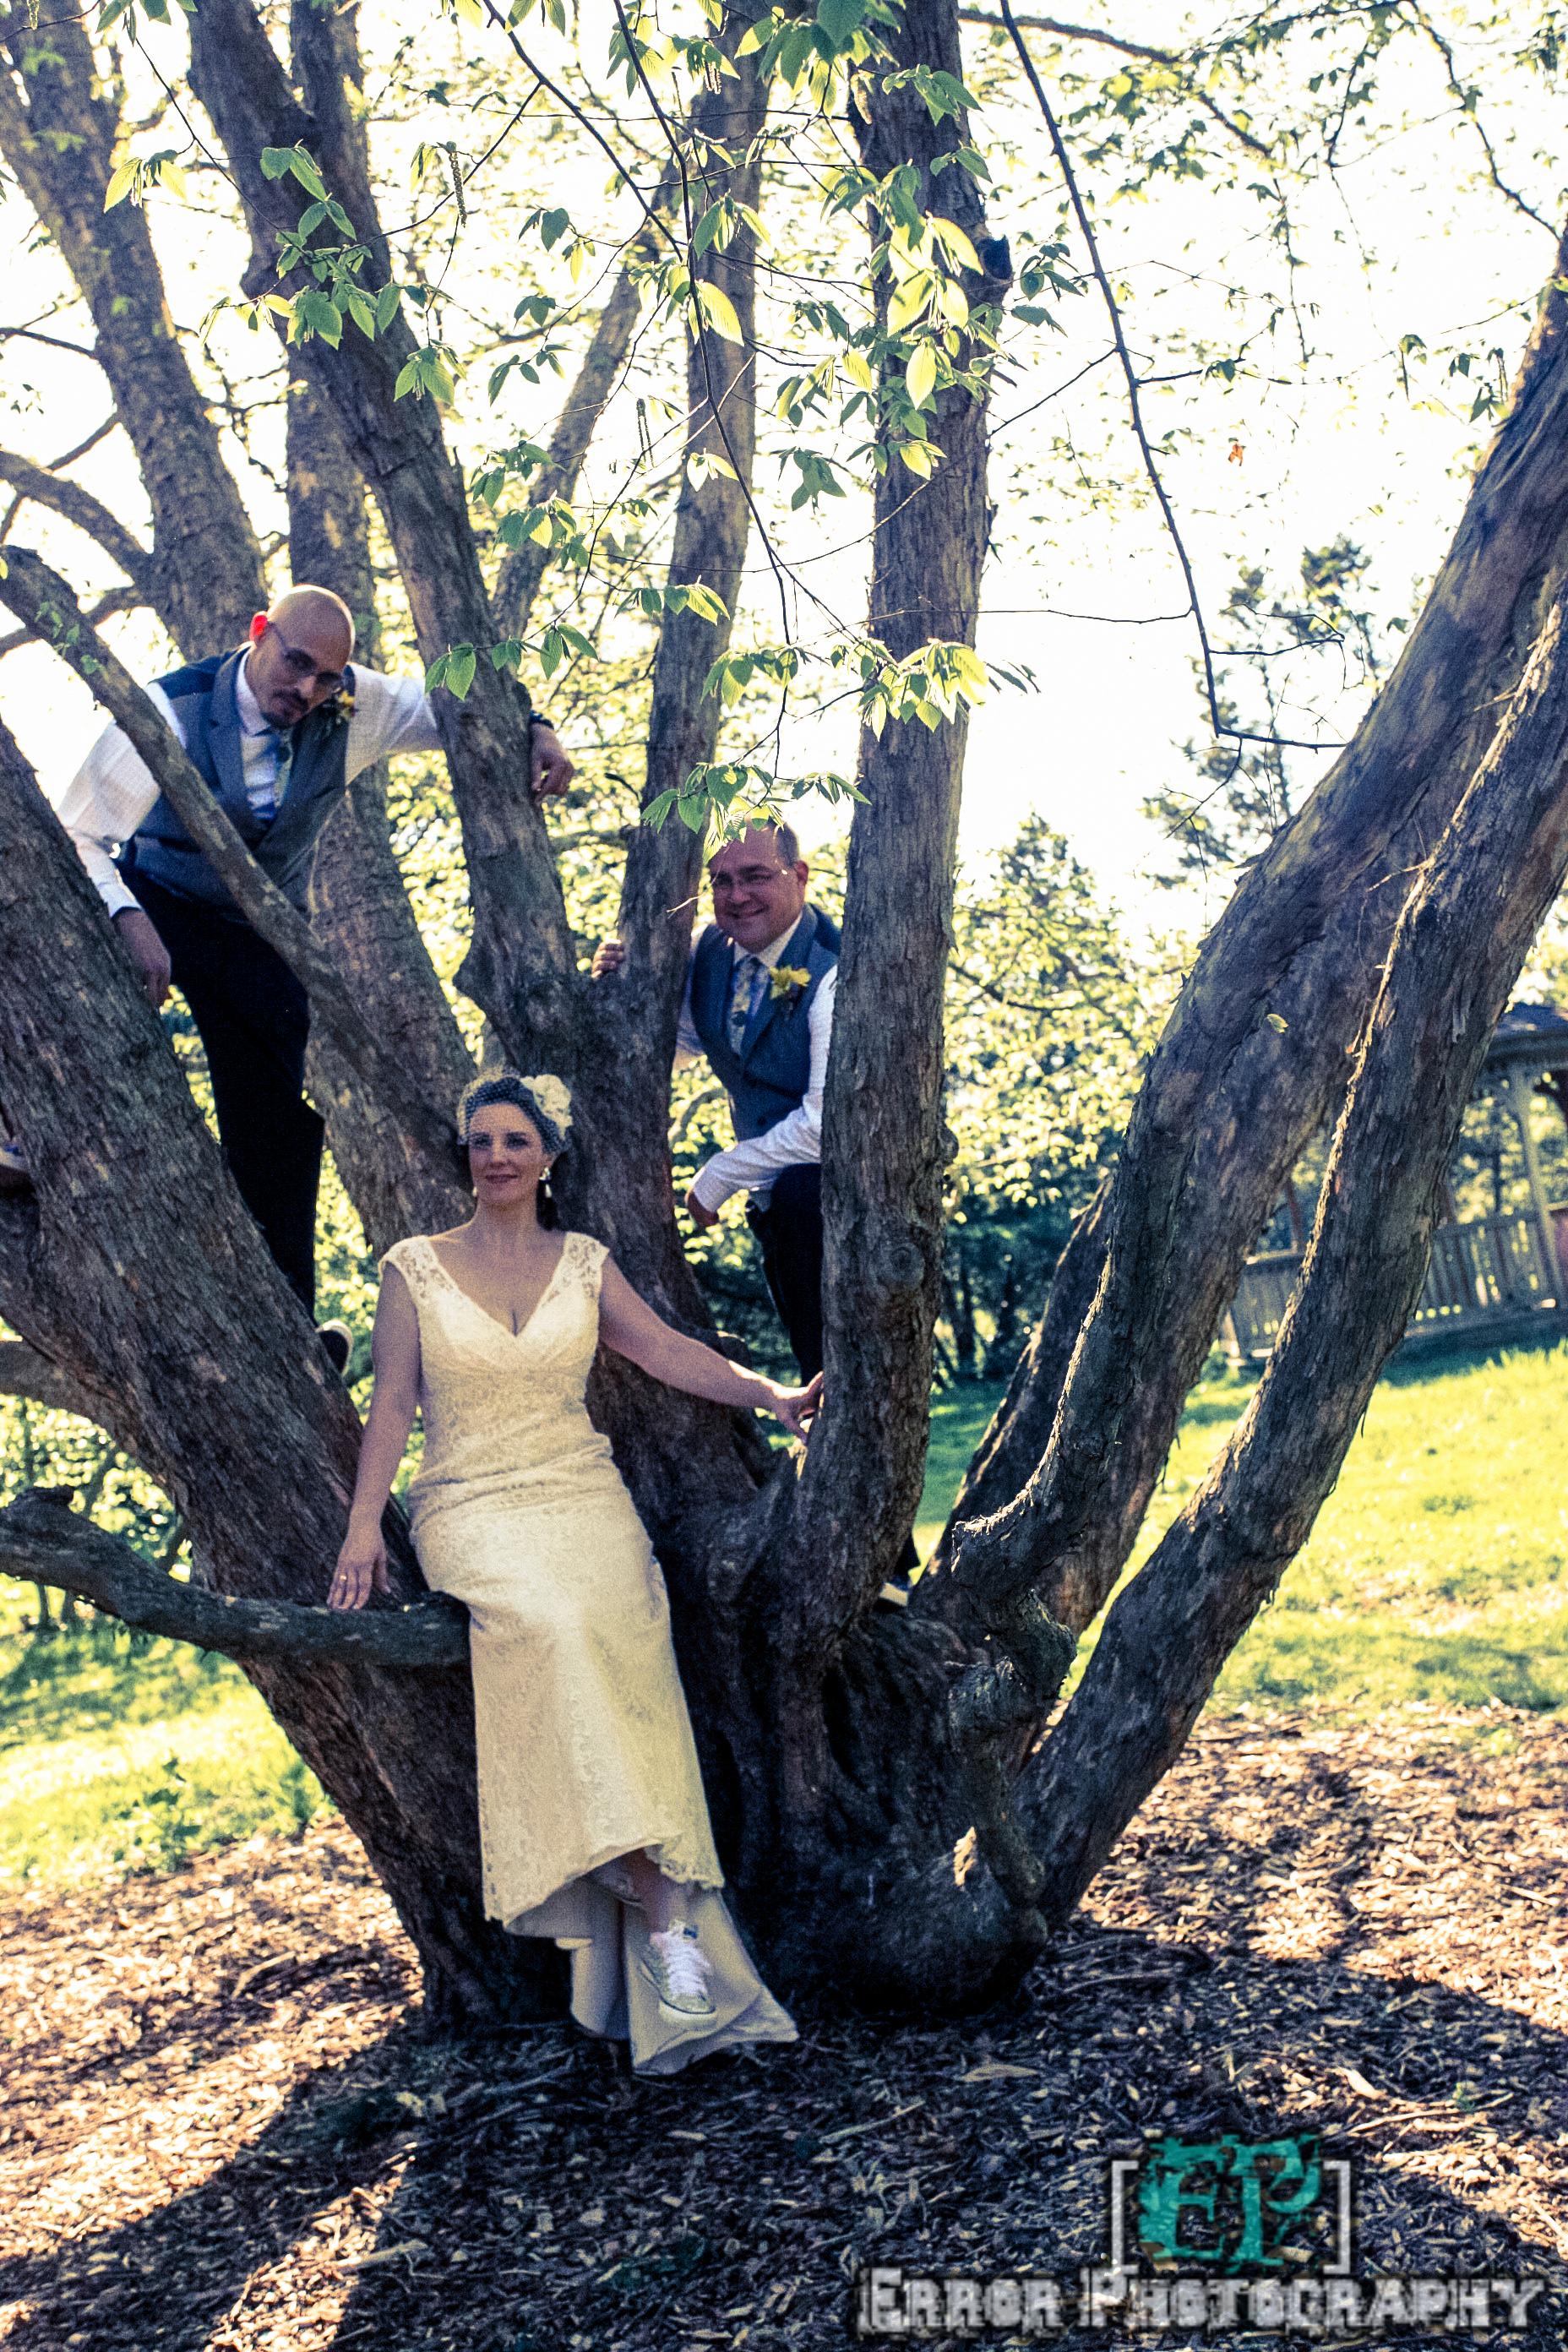 Wedding photos 5-4-13 Error Photography wm-36.jpg